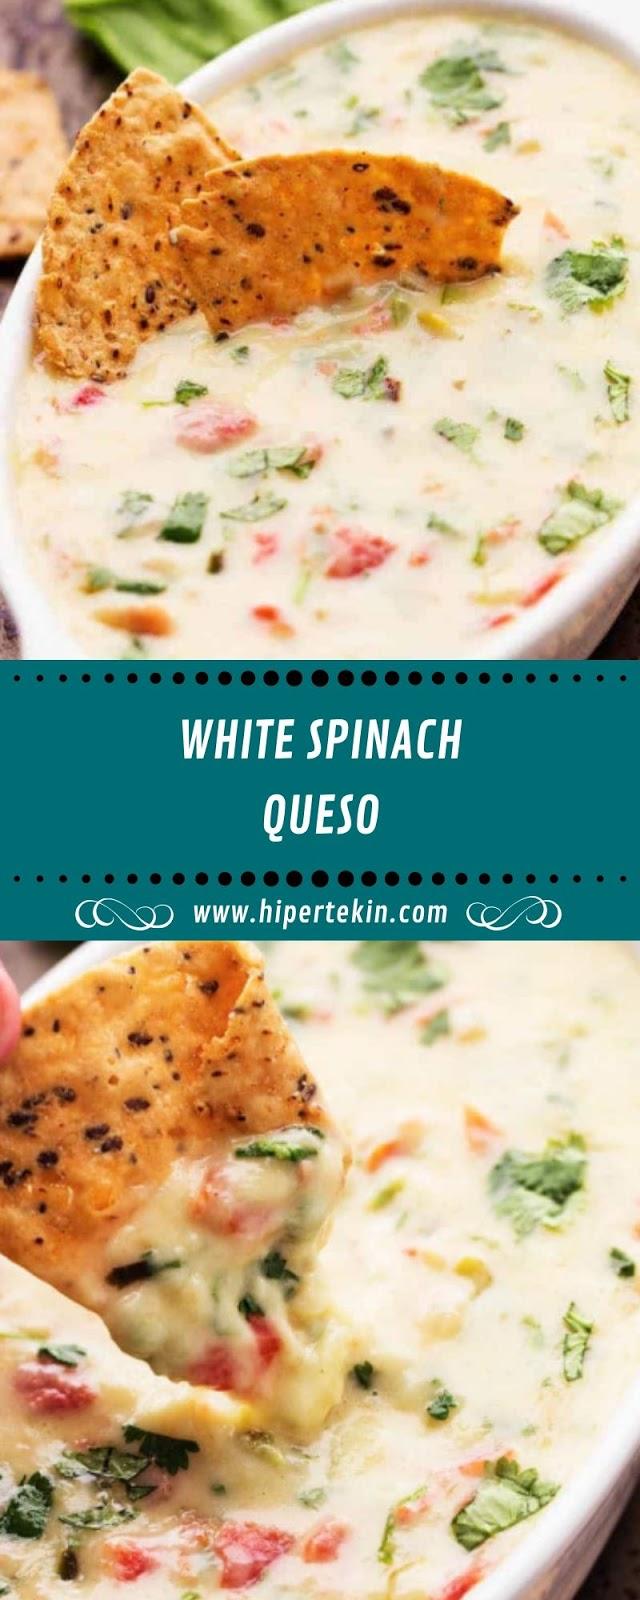 WHITE SPINACH QUESO